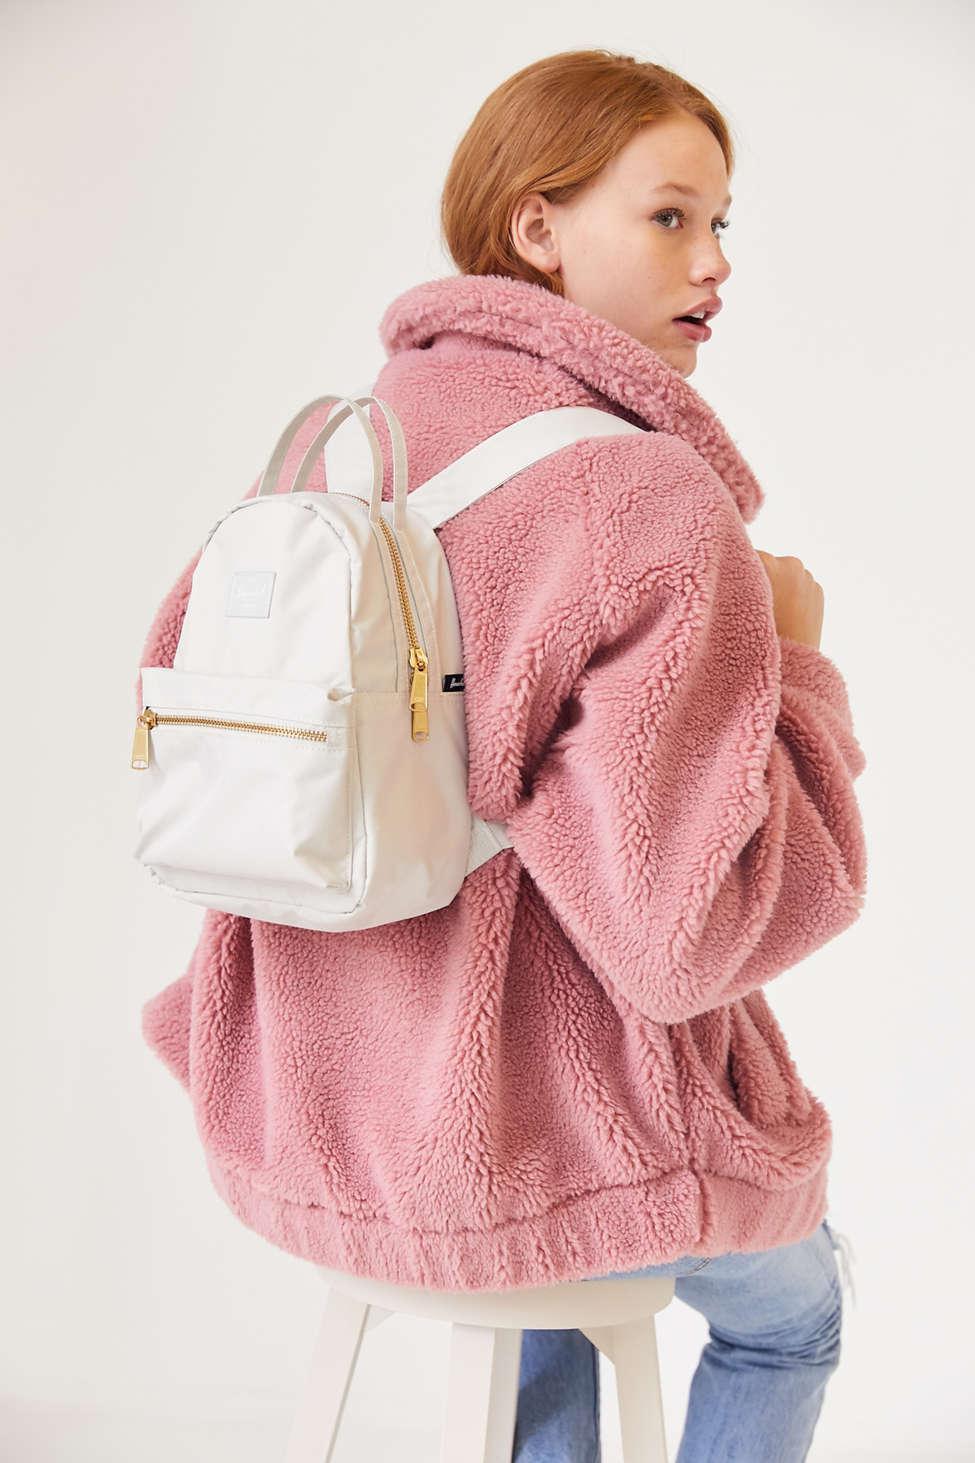 837374bf1792 Lyst - Herschel Supply Co. Nova Light Mini Backpack in Natural